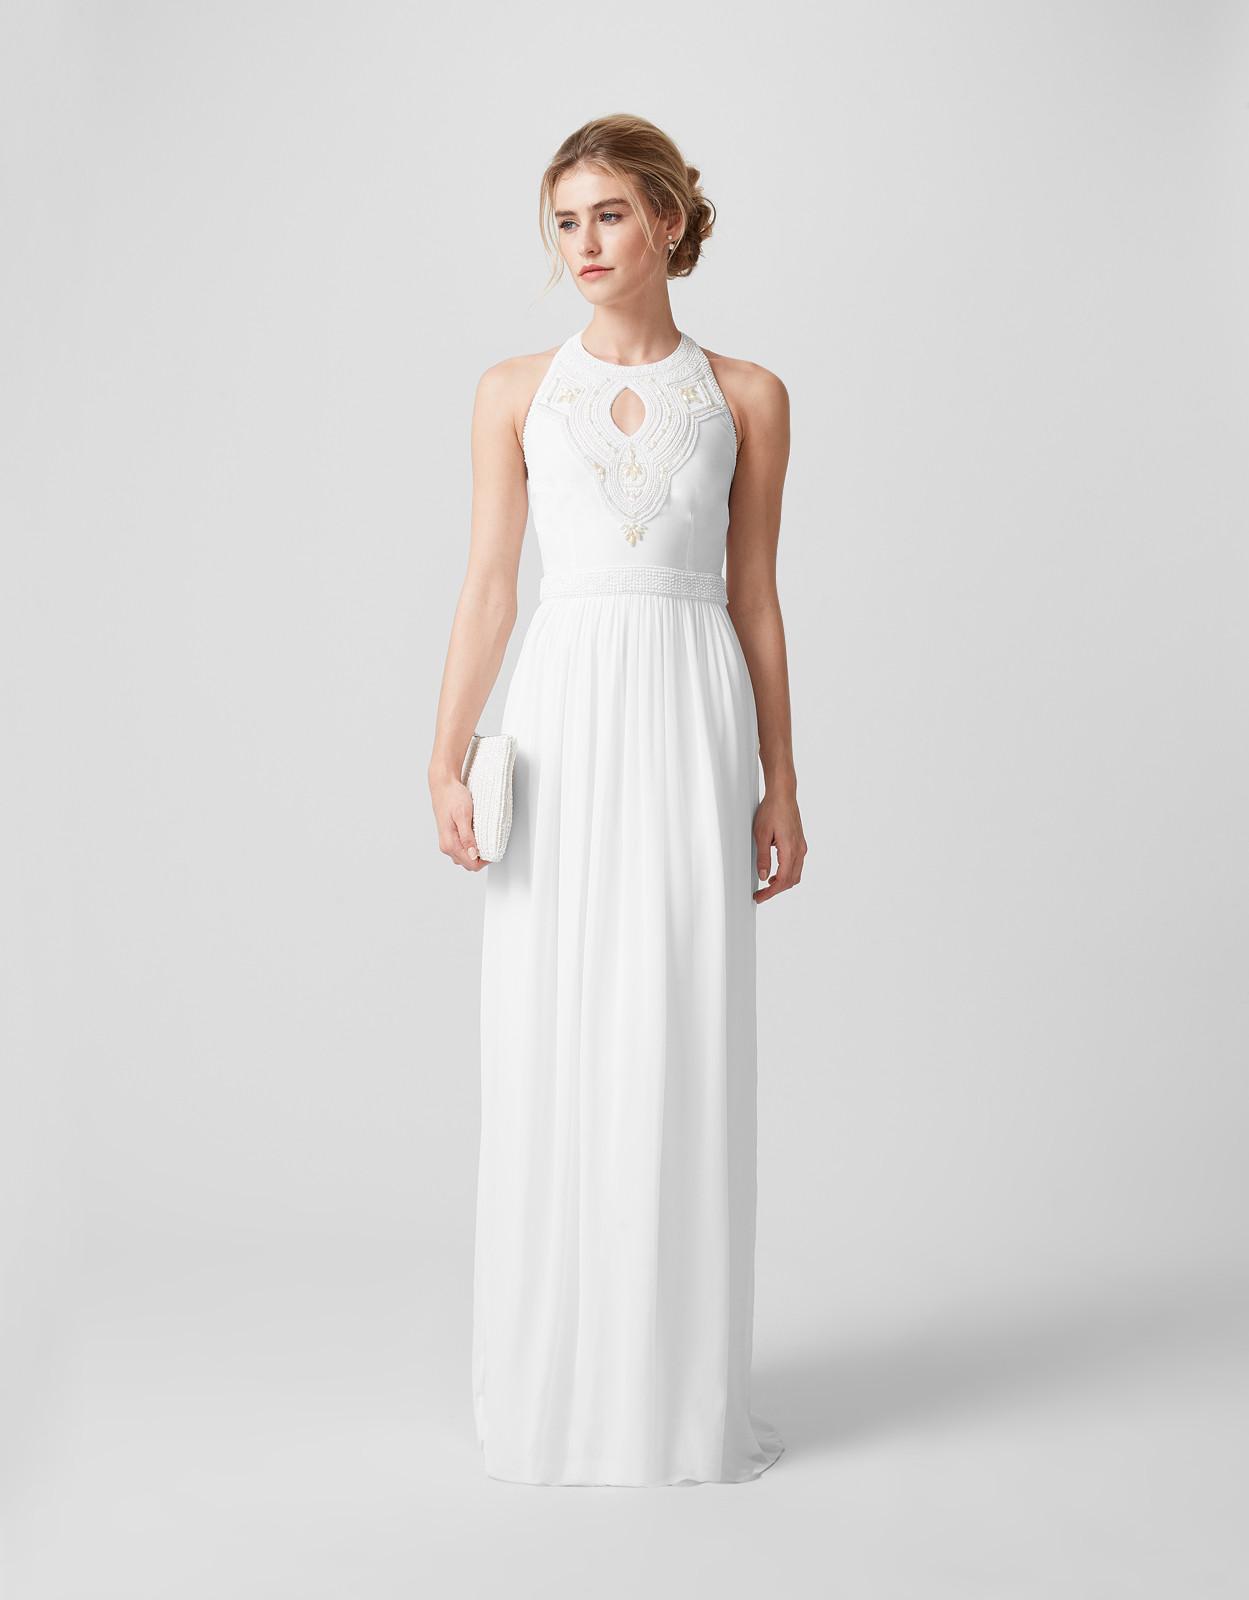 Wedding Dresses by Monsoon - Weddingwire.ca - photo #14